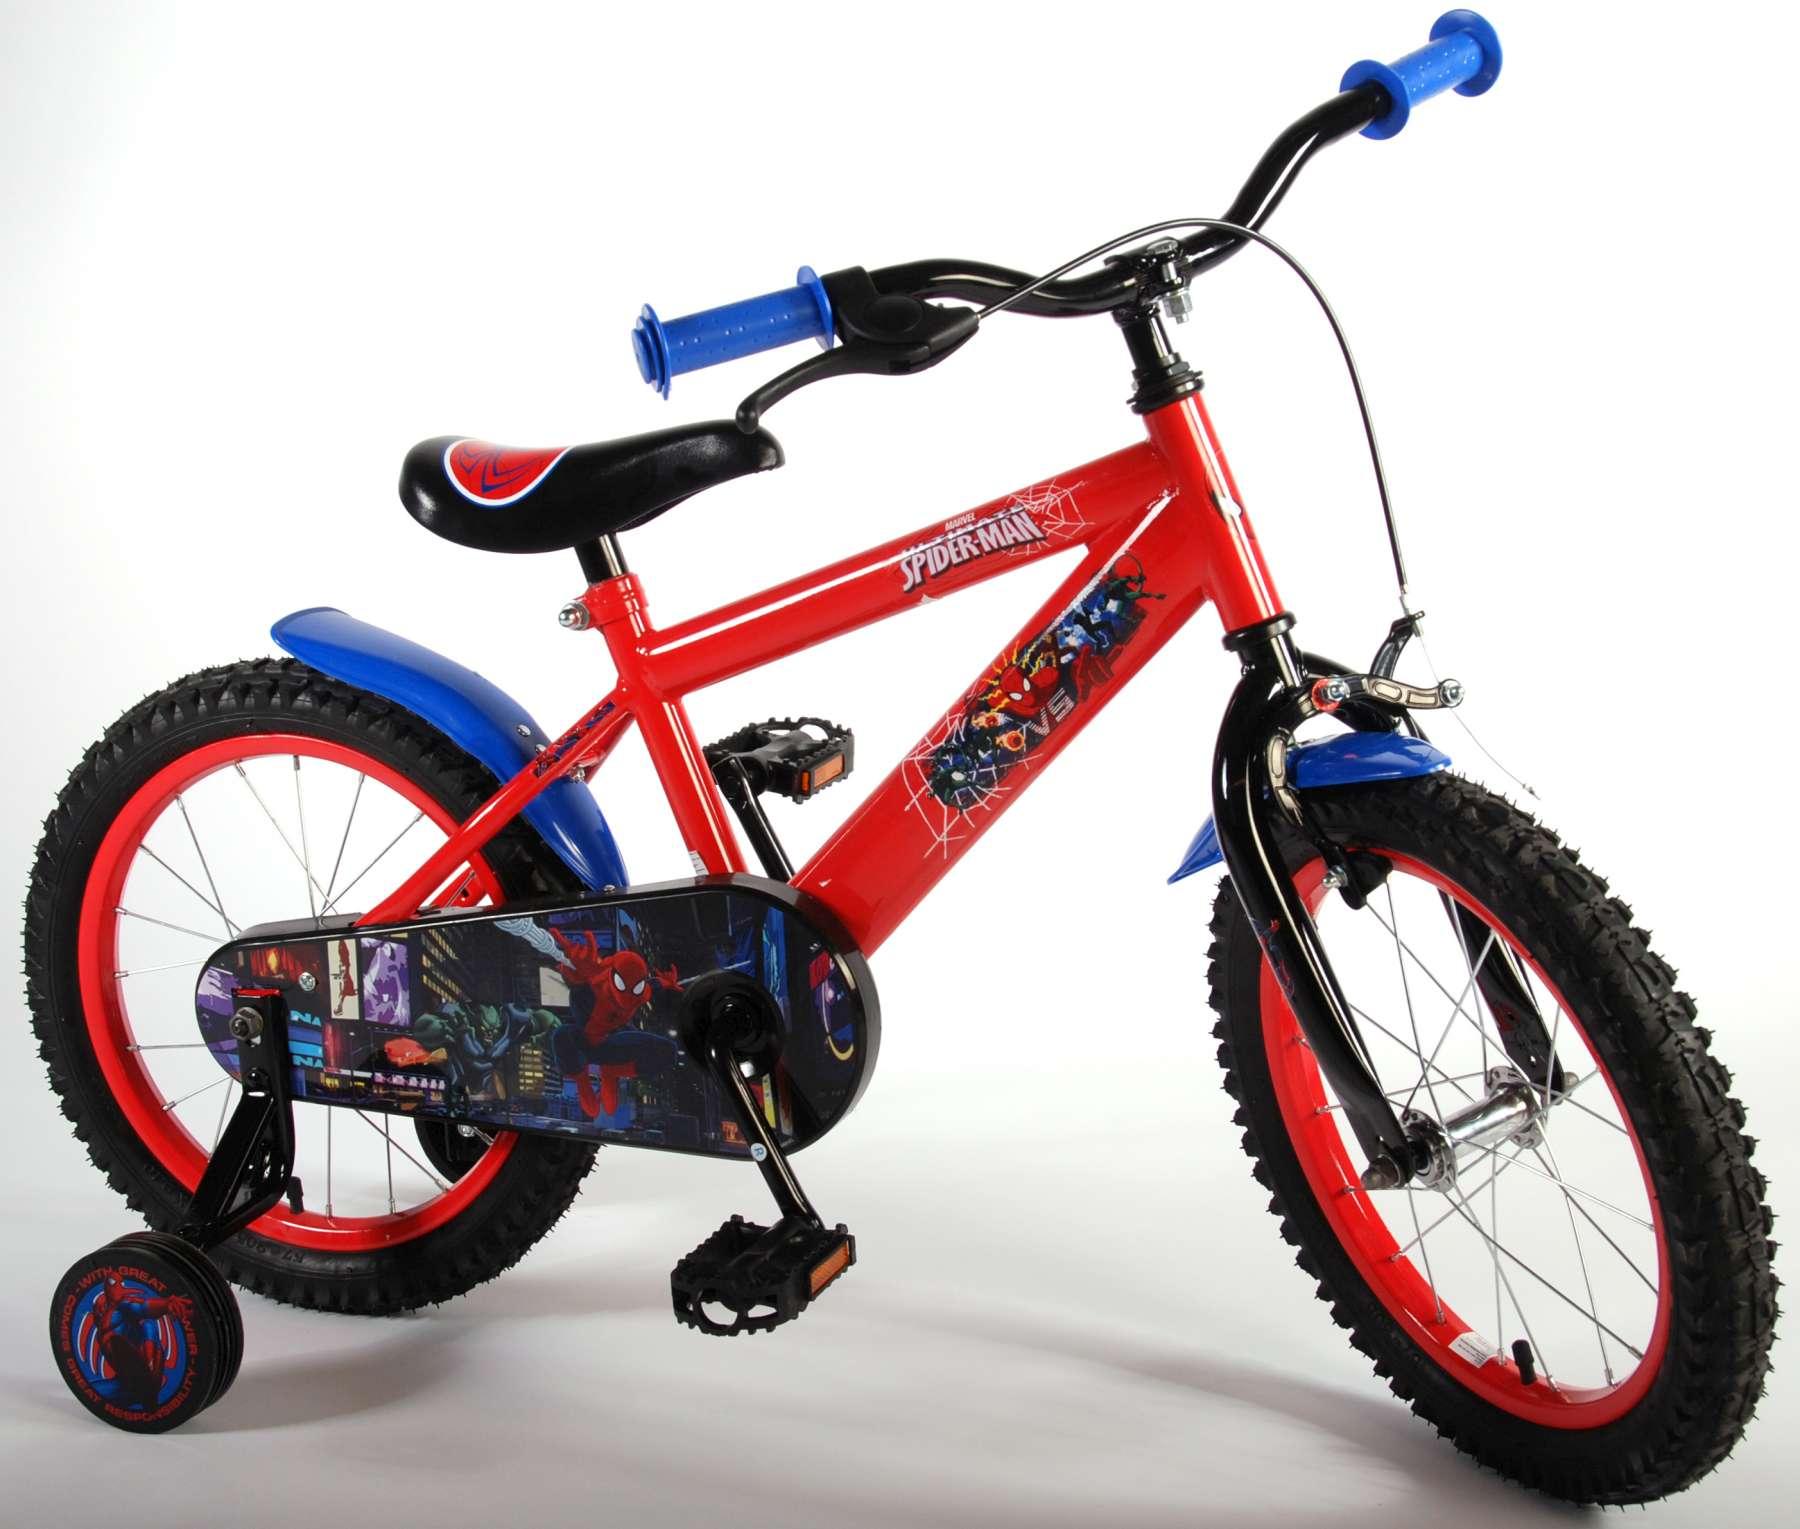 16 Zoll Marvel Disney Spiderman Kinderfahrrad Bmx Fahrrad Kinder kids bike